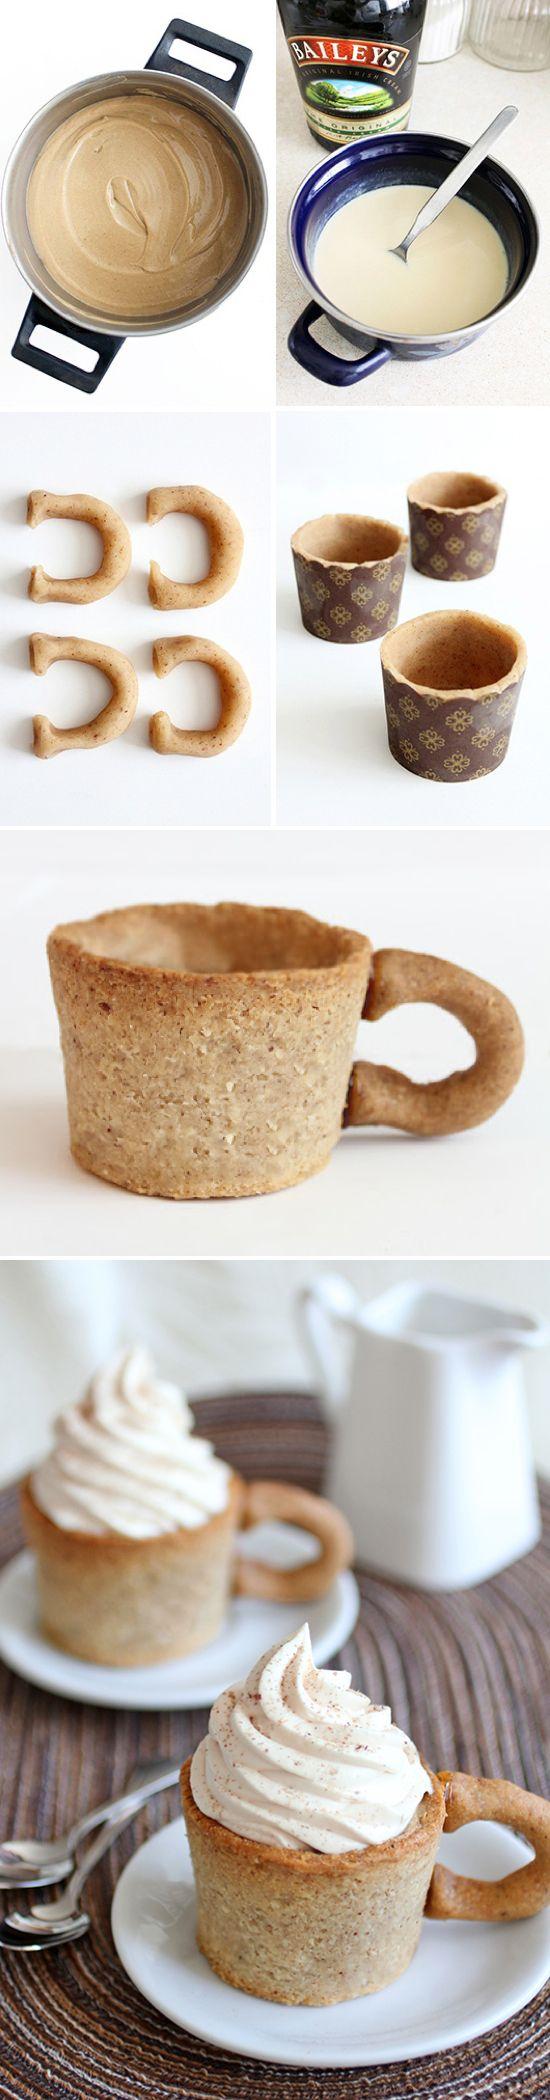 DIY: Cake Cups <3